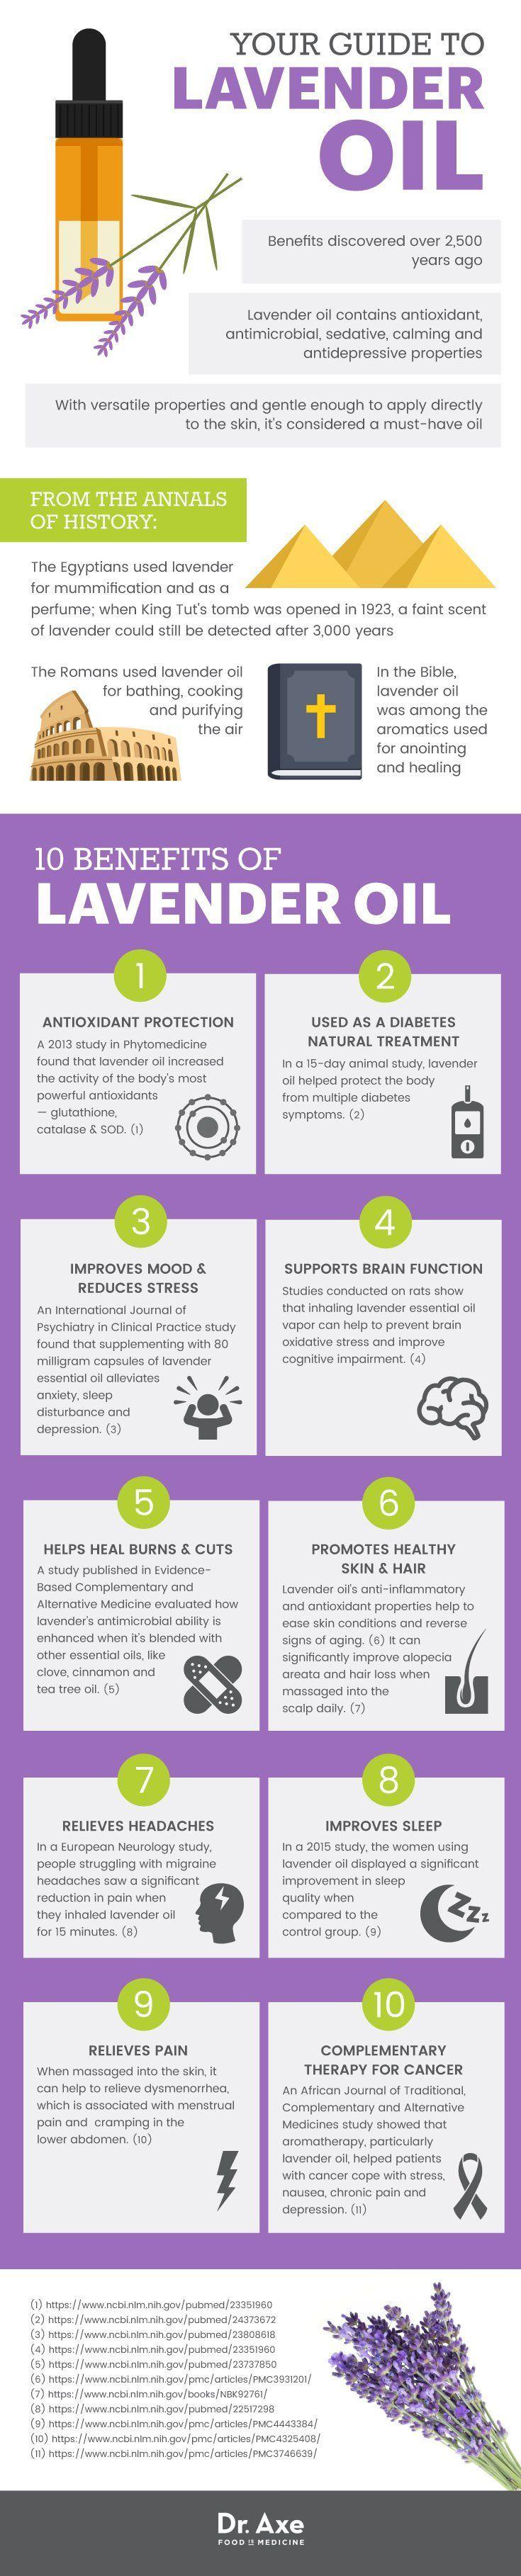 Lavender Oil Benefits Guide